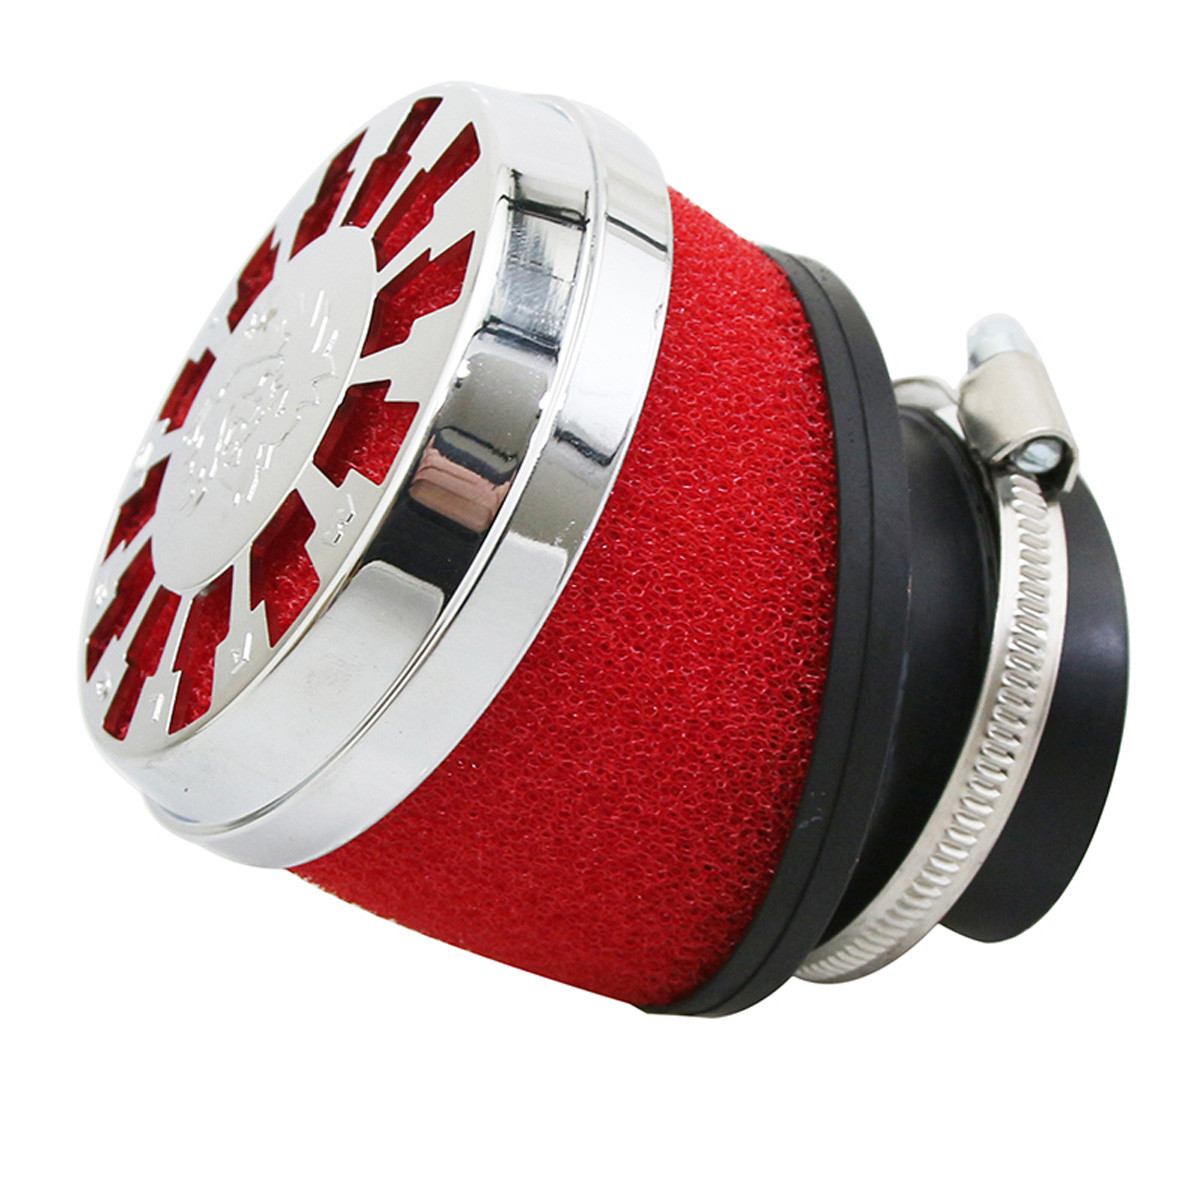 Filtre à Air PHBH PWK - Malossi Red Filter E13 42 / 50 / 60mm coudé 25 degrés